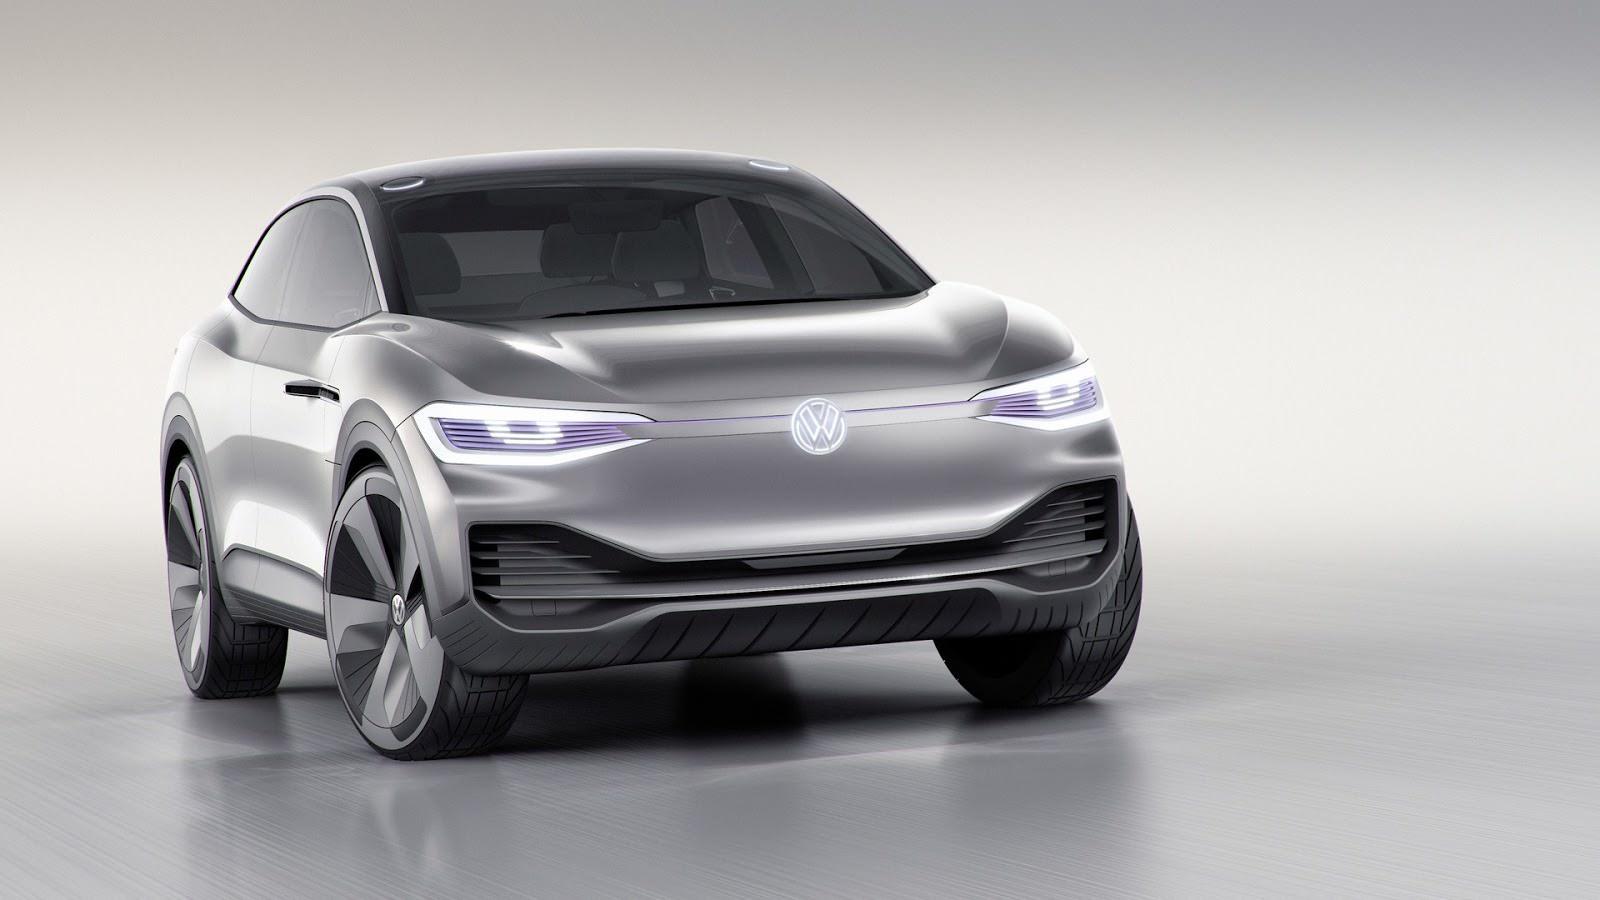 Электрический кроссовер Volkswagen I.D. Crozz Concept 2017